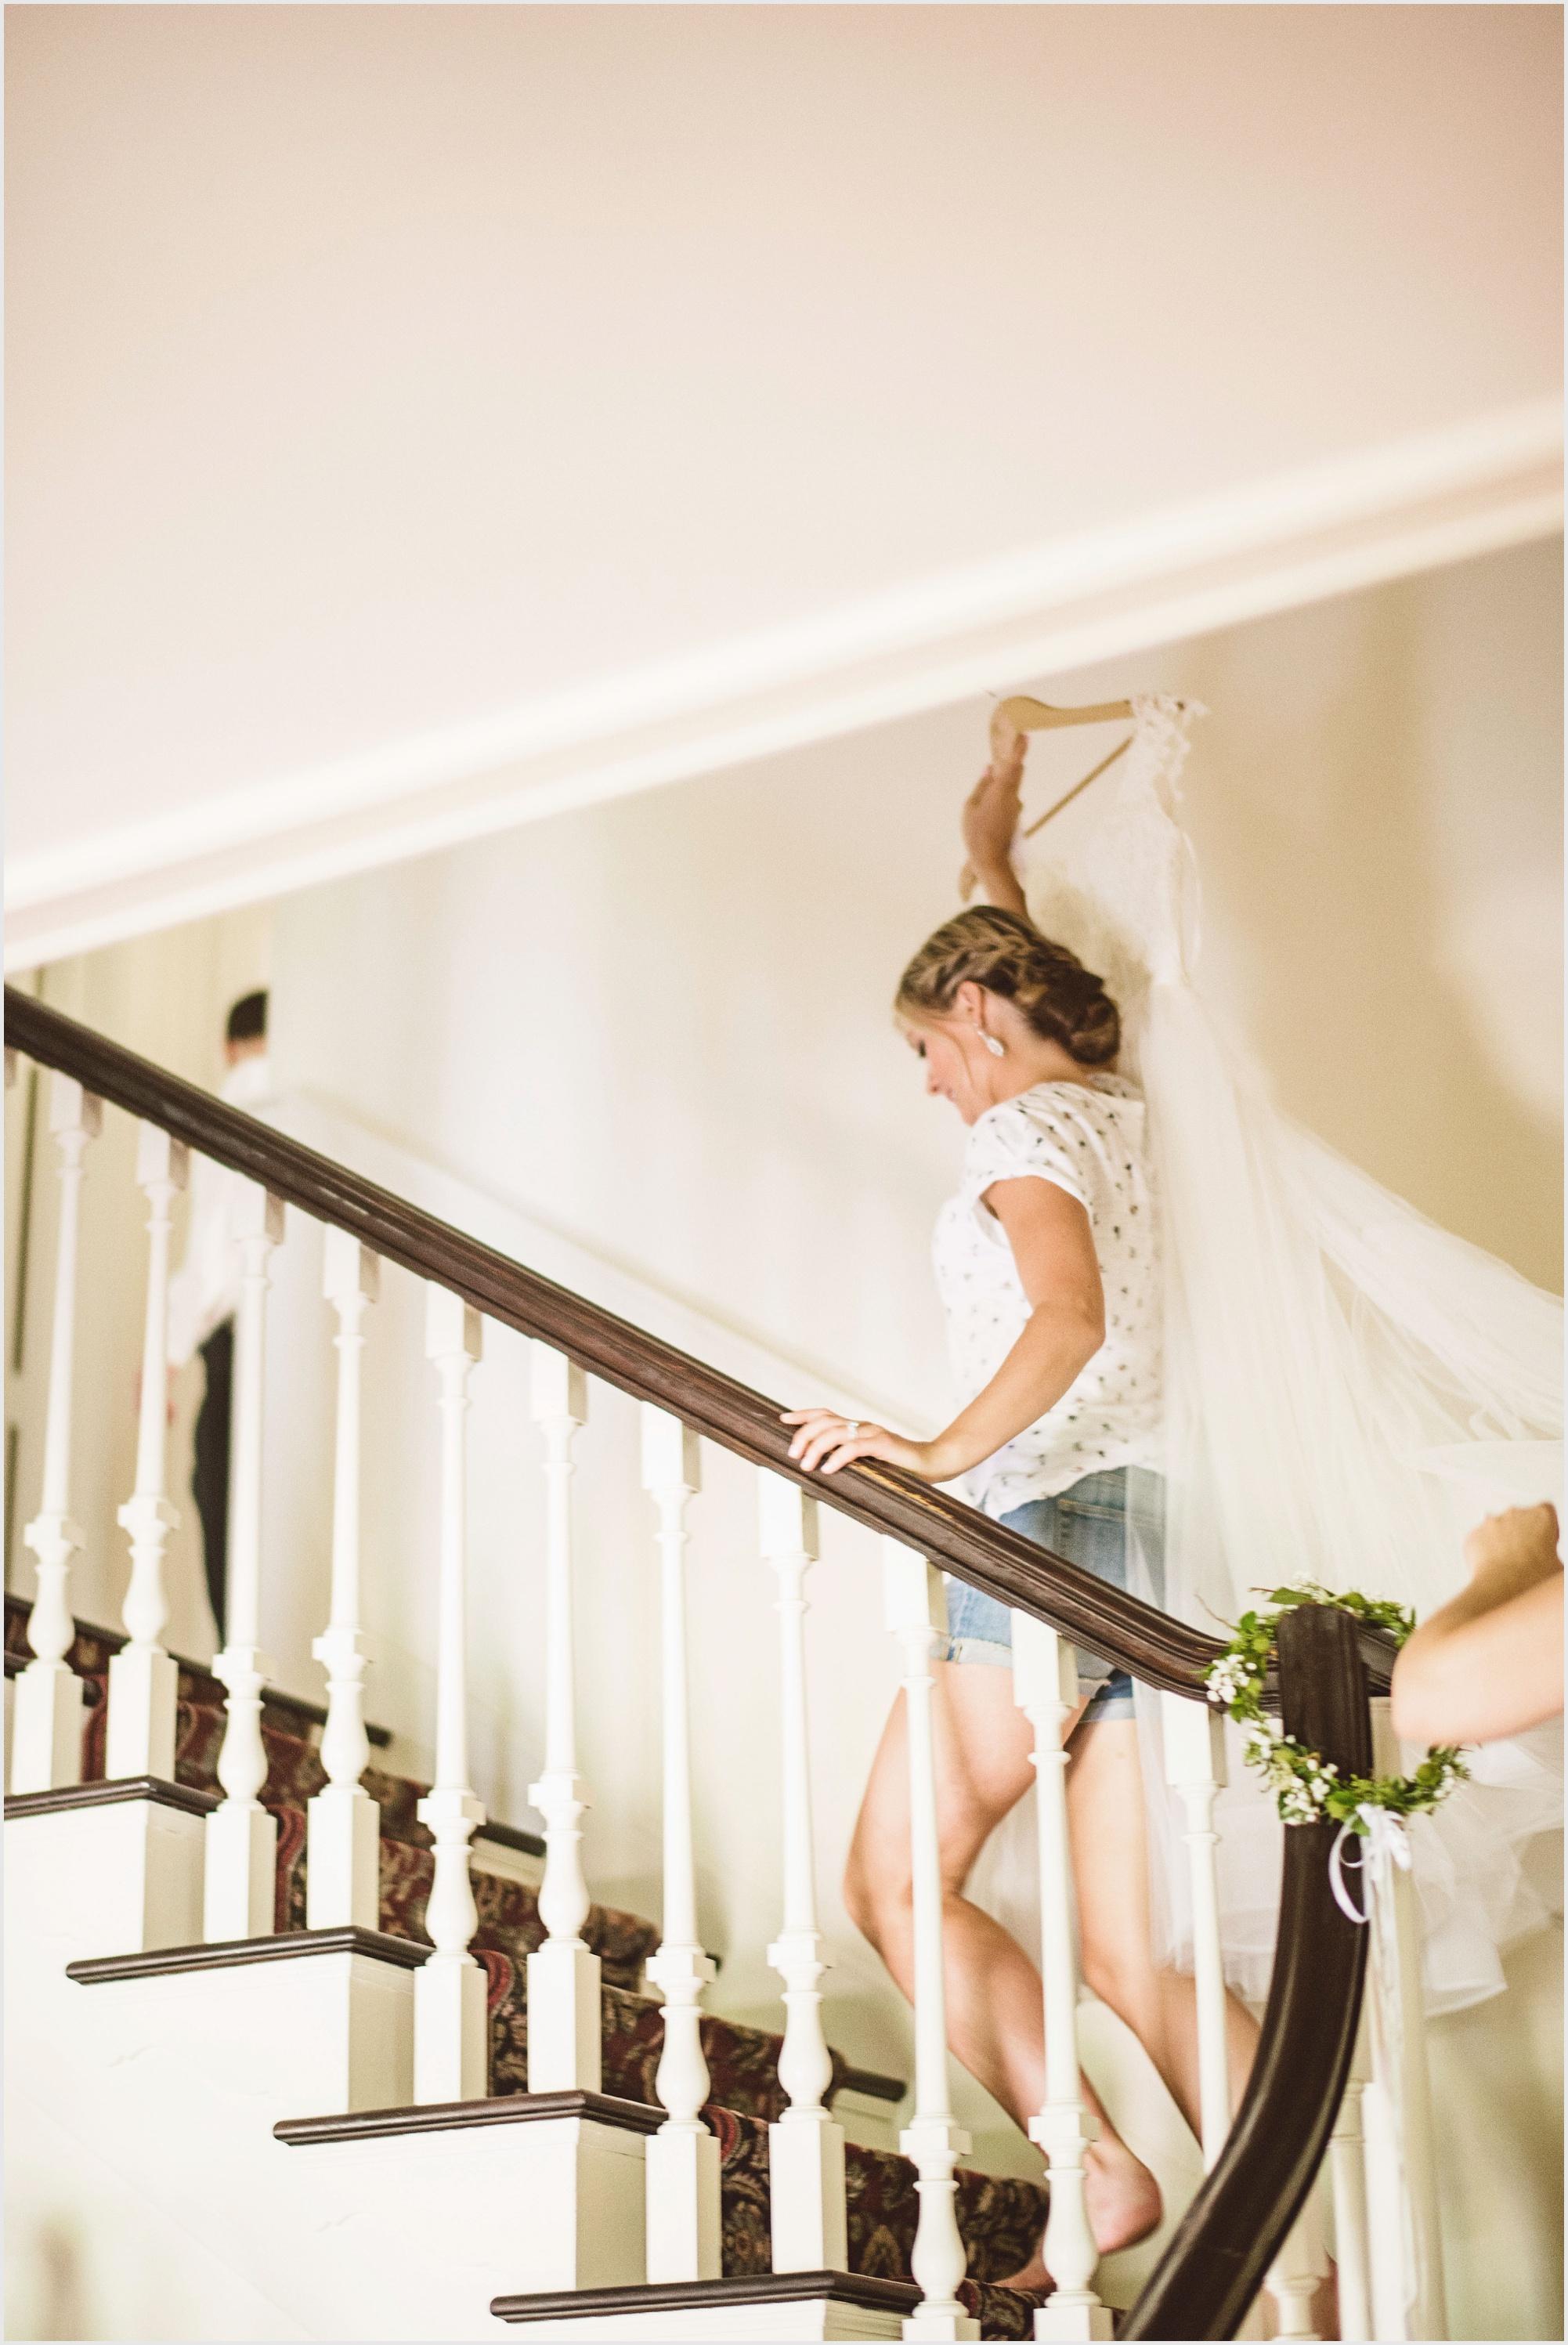 maura_david_james_j_hill_wedding_lucas_botz_photography_002.jpg